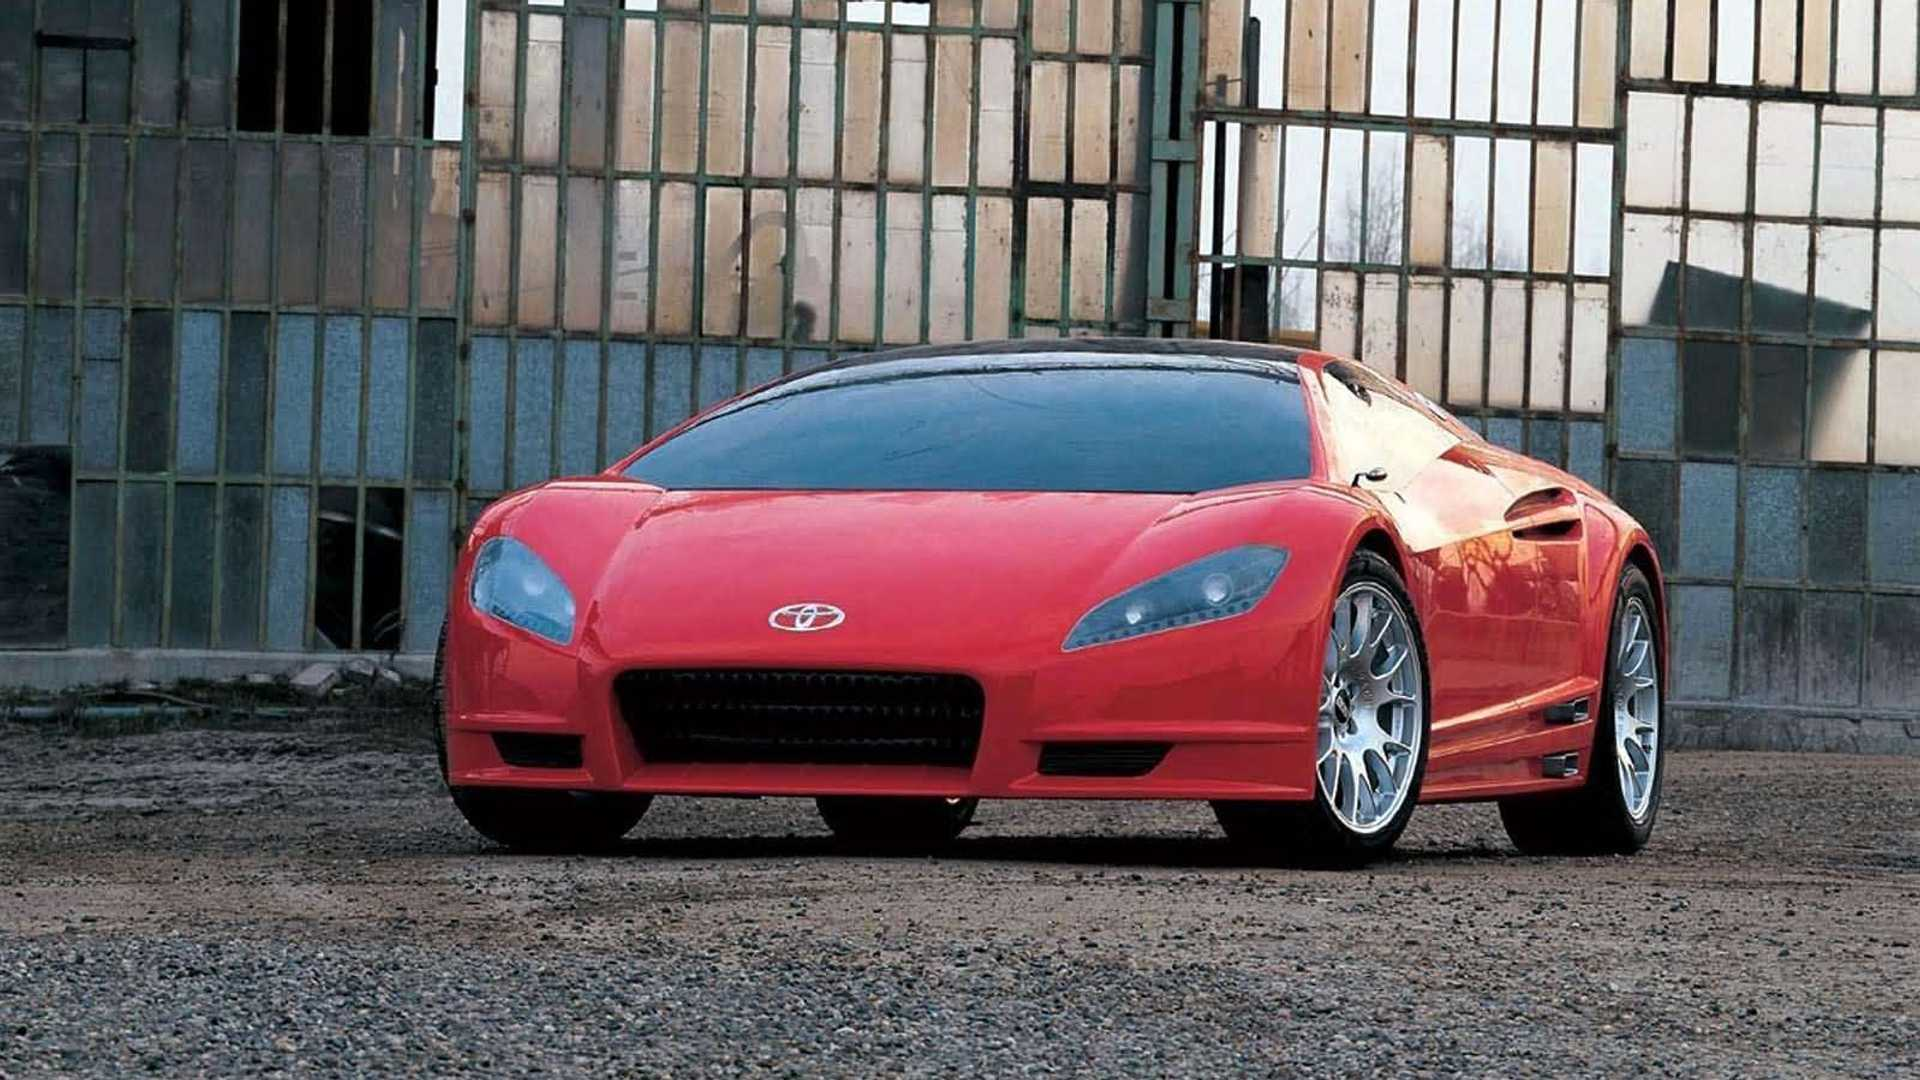 Toyota-Alessandro-Volta-concept-2004-1